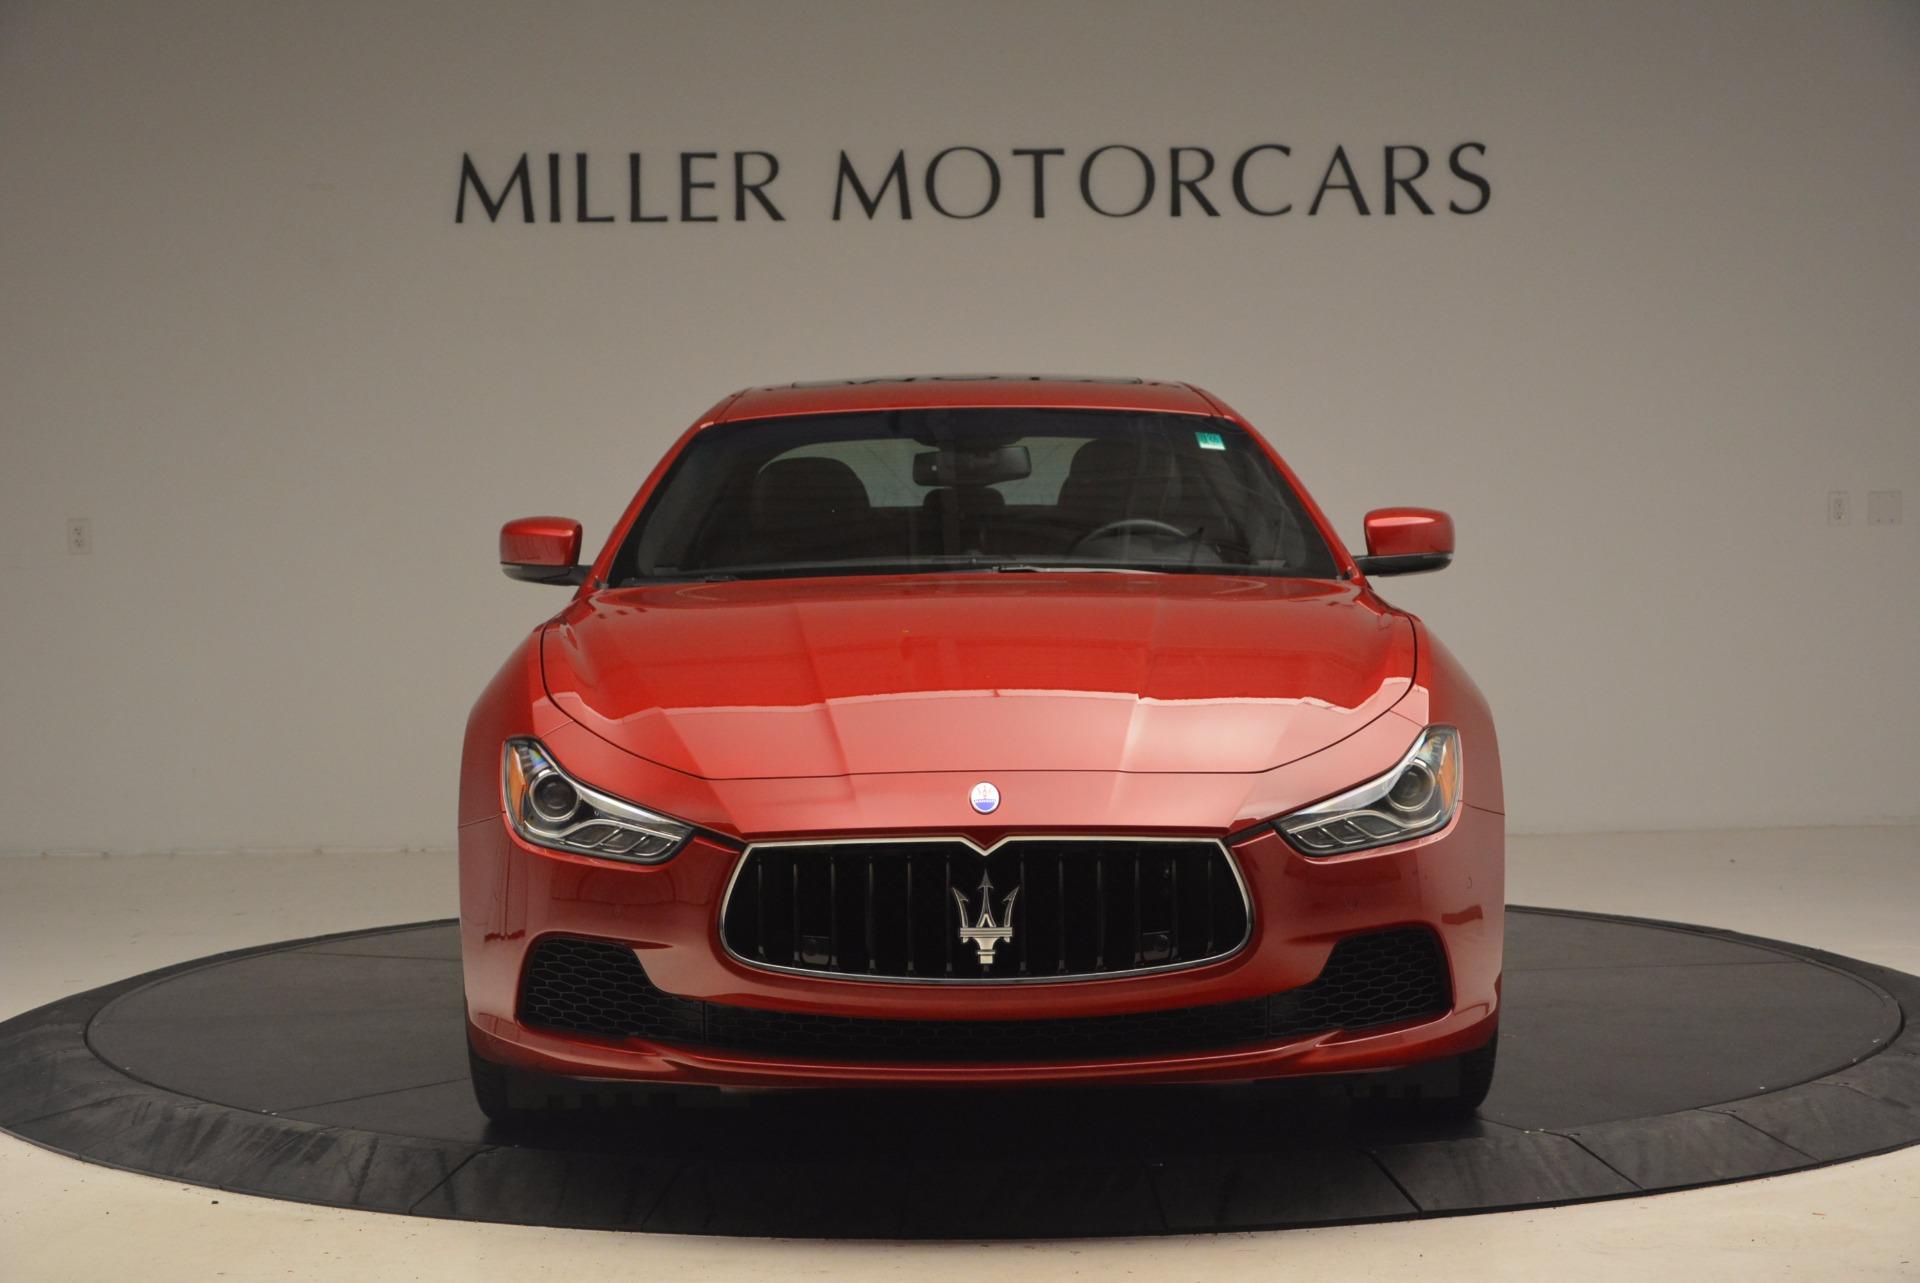 Used 2014 Maserati Ghibli S Q4 For Sale In Greenwich, CT. Alfa Romeo of Greenwich, 7203 1158_p12